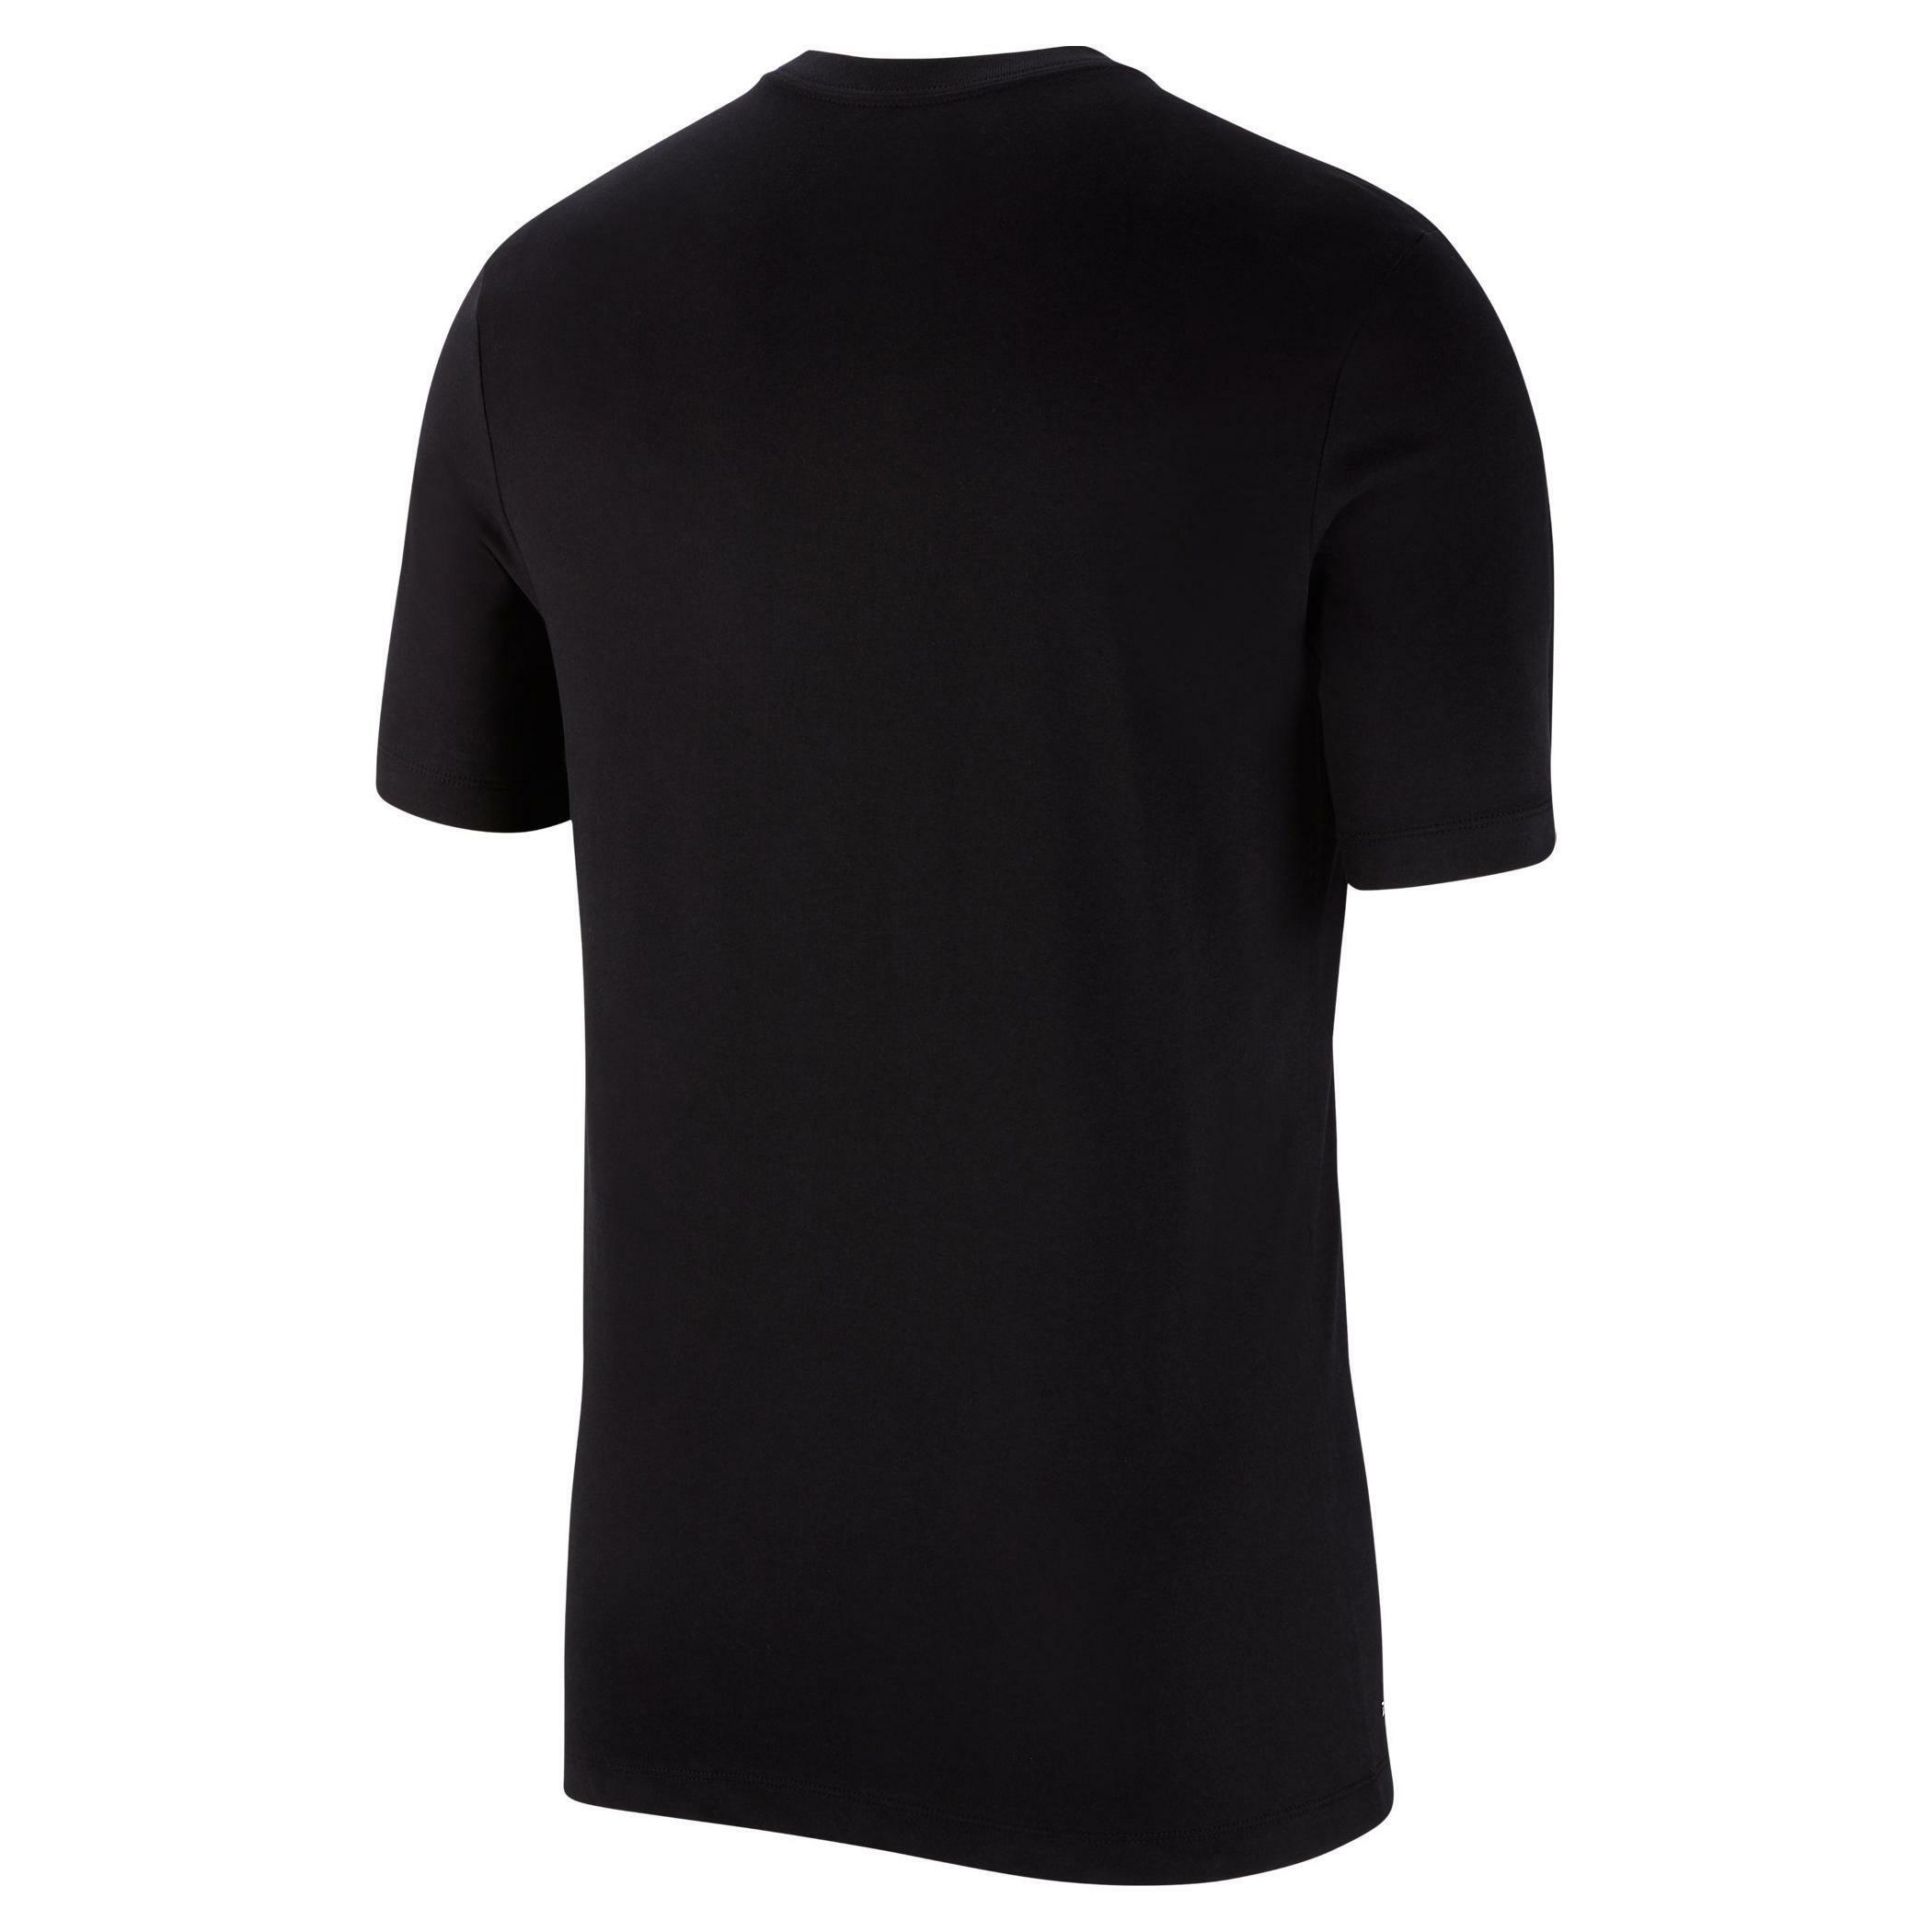 nike t-shirt nike uomo cd0956 010 nero